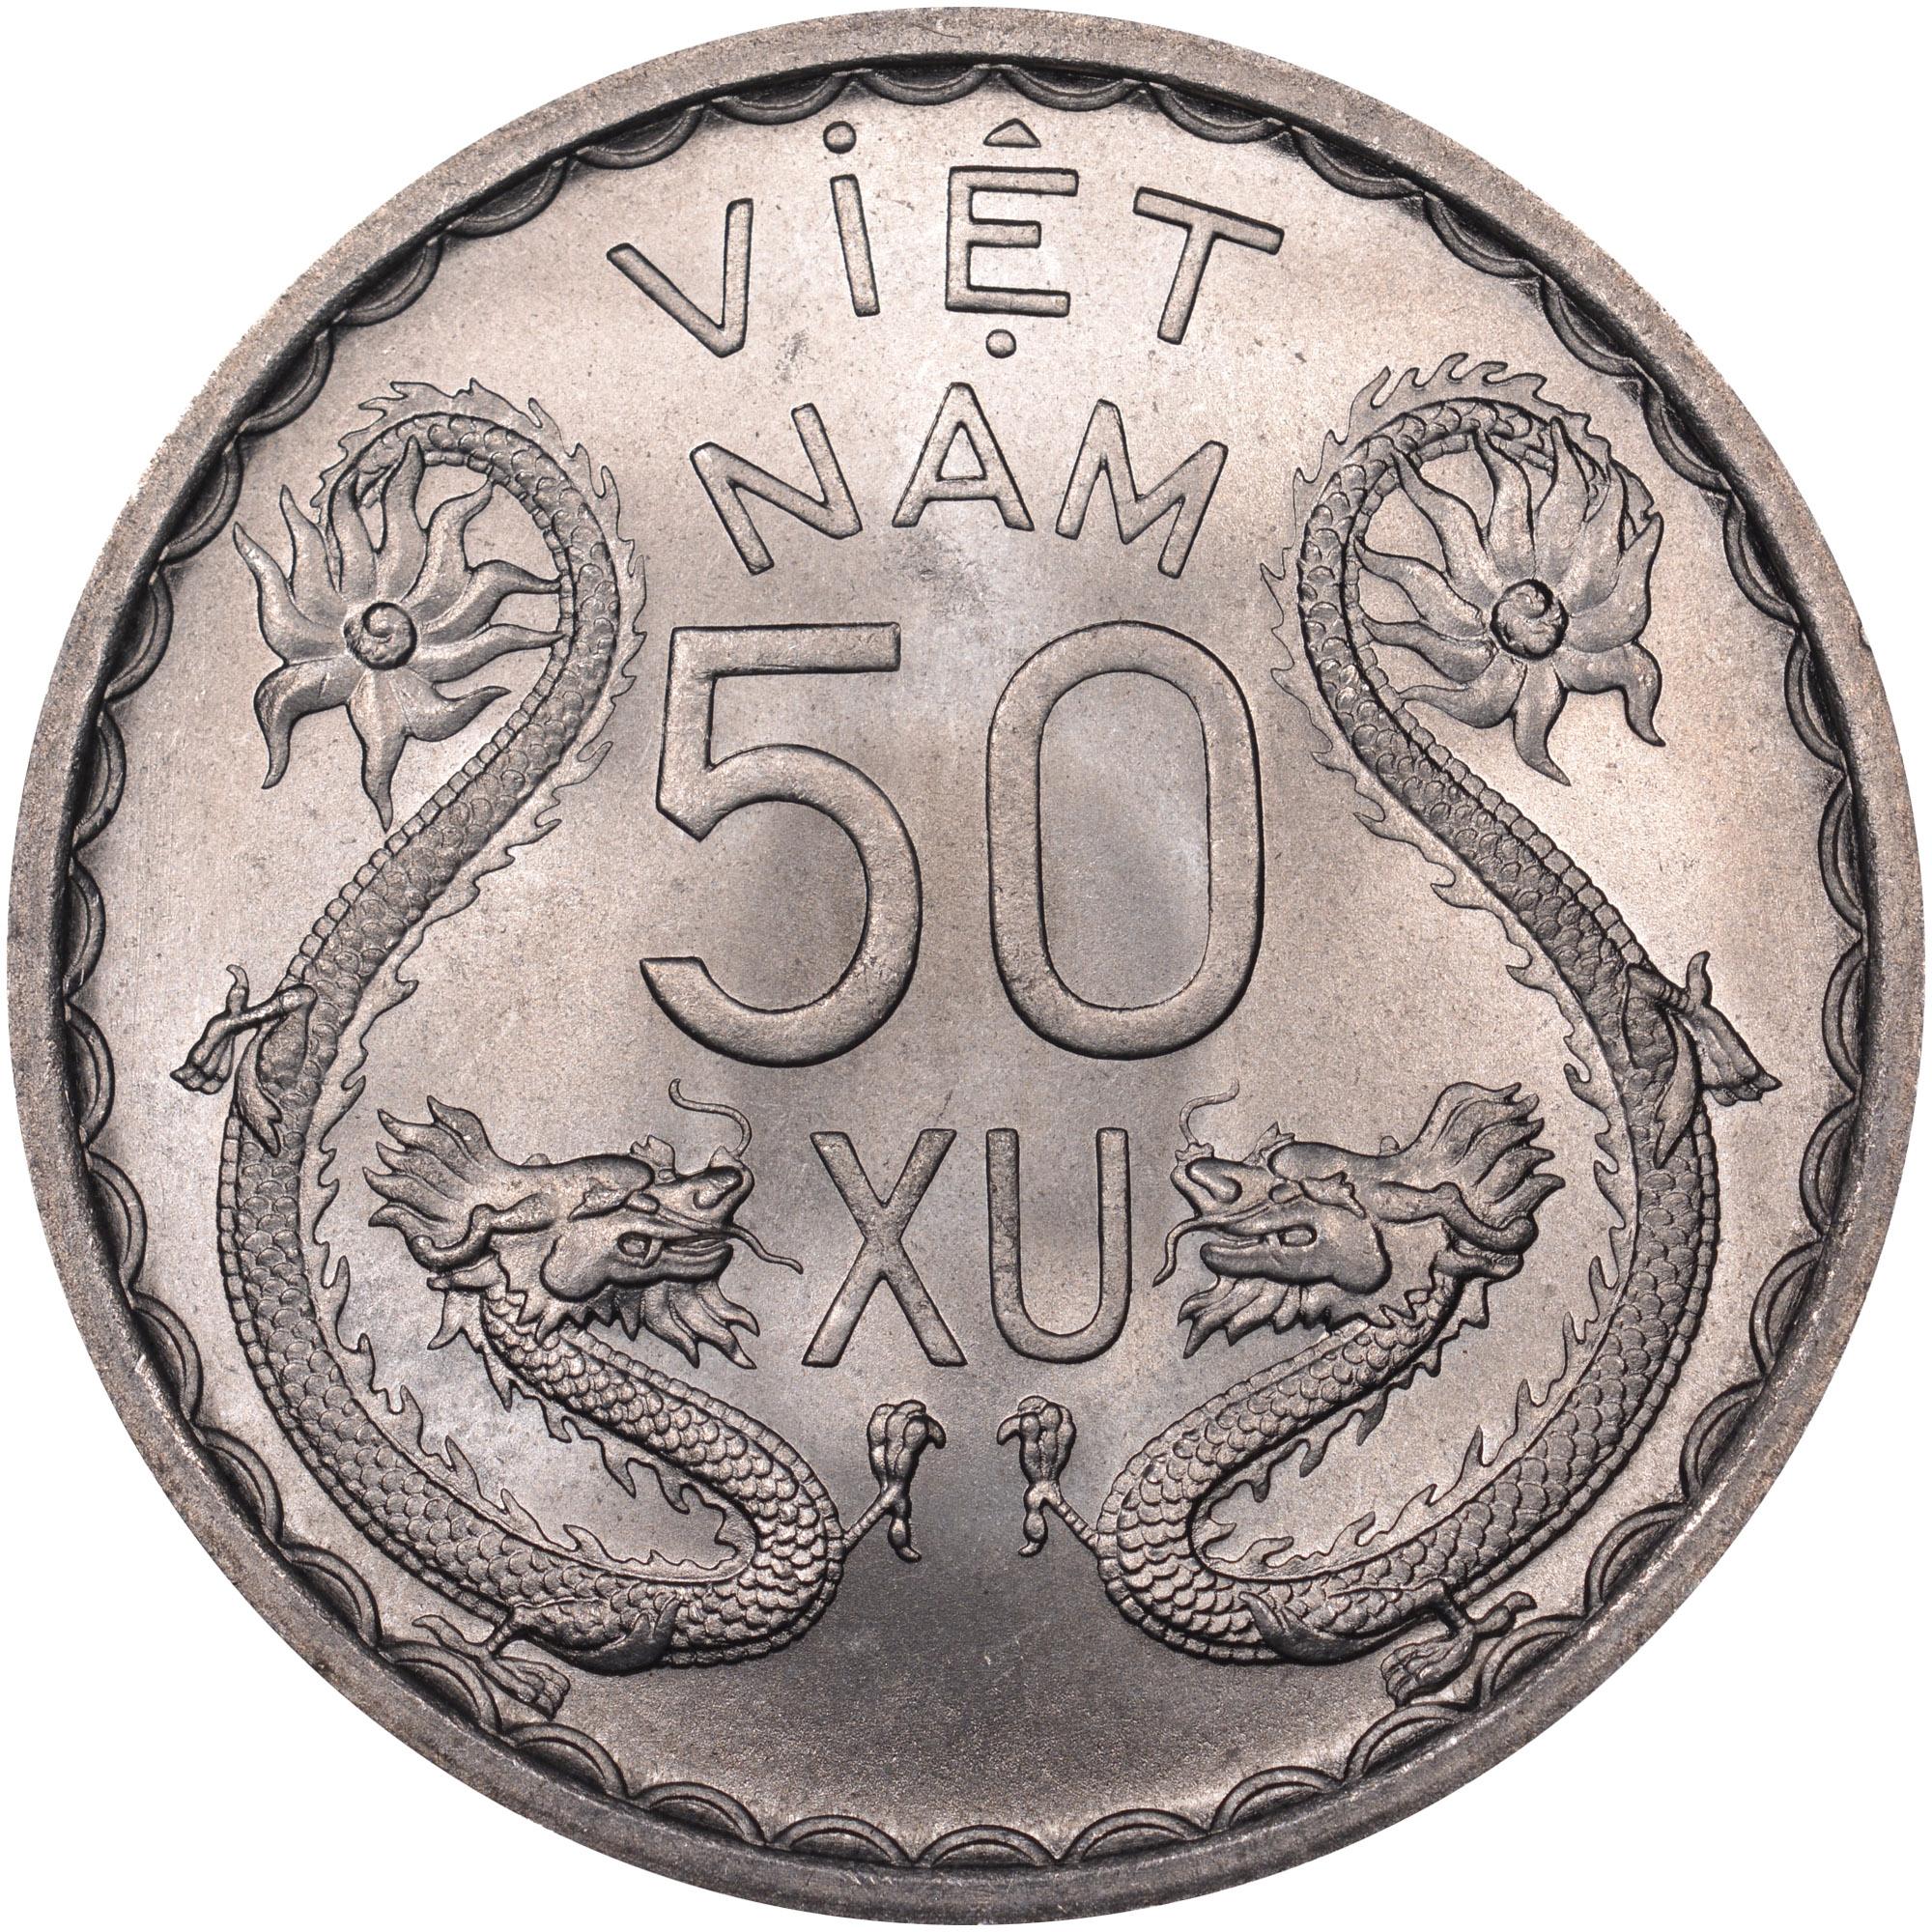 Viet Nam STATE OF SOUTH VIET NAM 50 Xu reverse